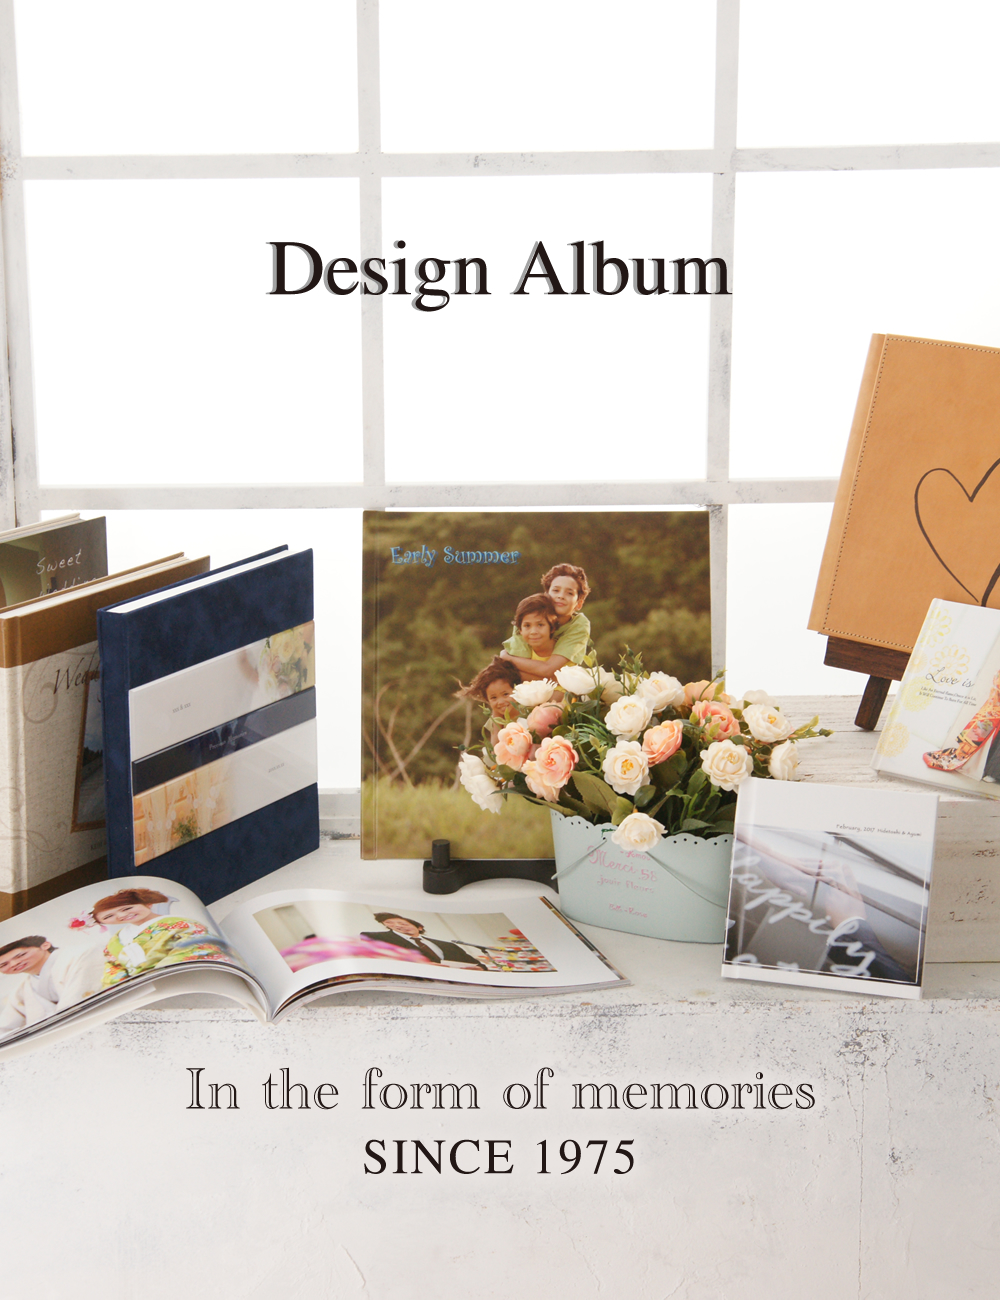 Design Album デザインアルバム